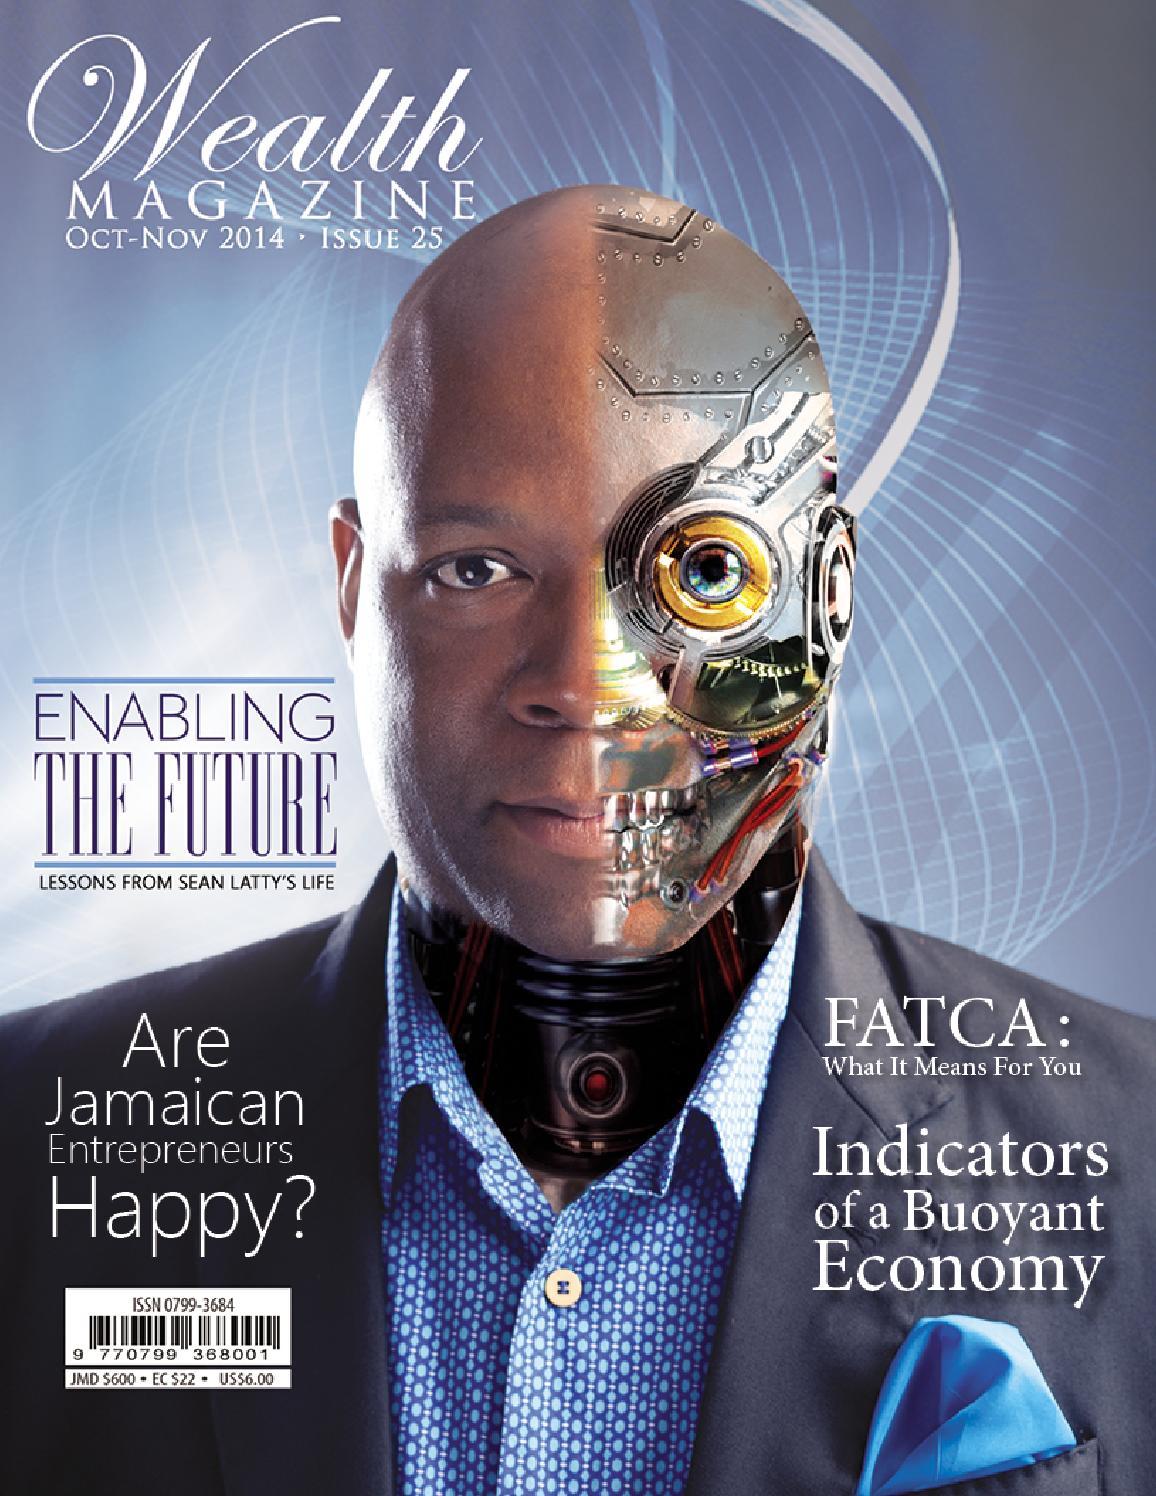 Wealth Mag i25 by Wealth Magazine Ja #1 Business Publication - issuu